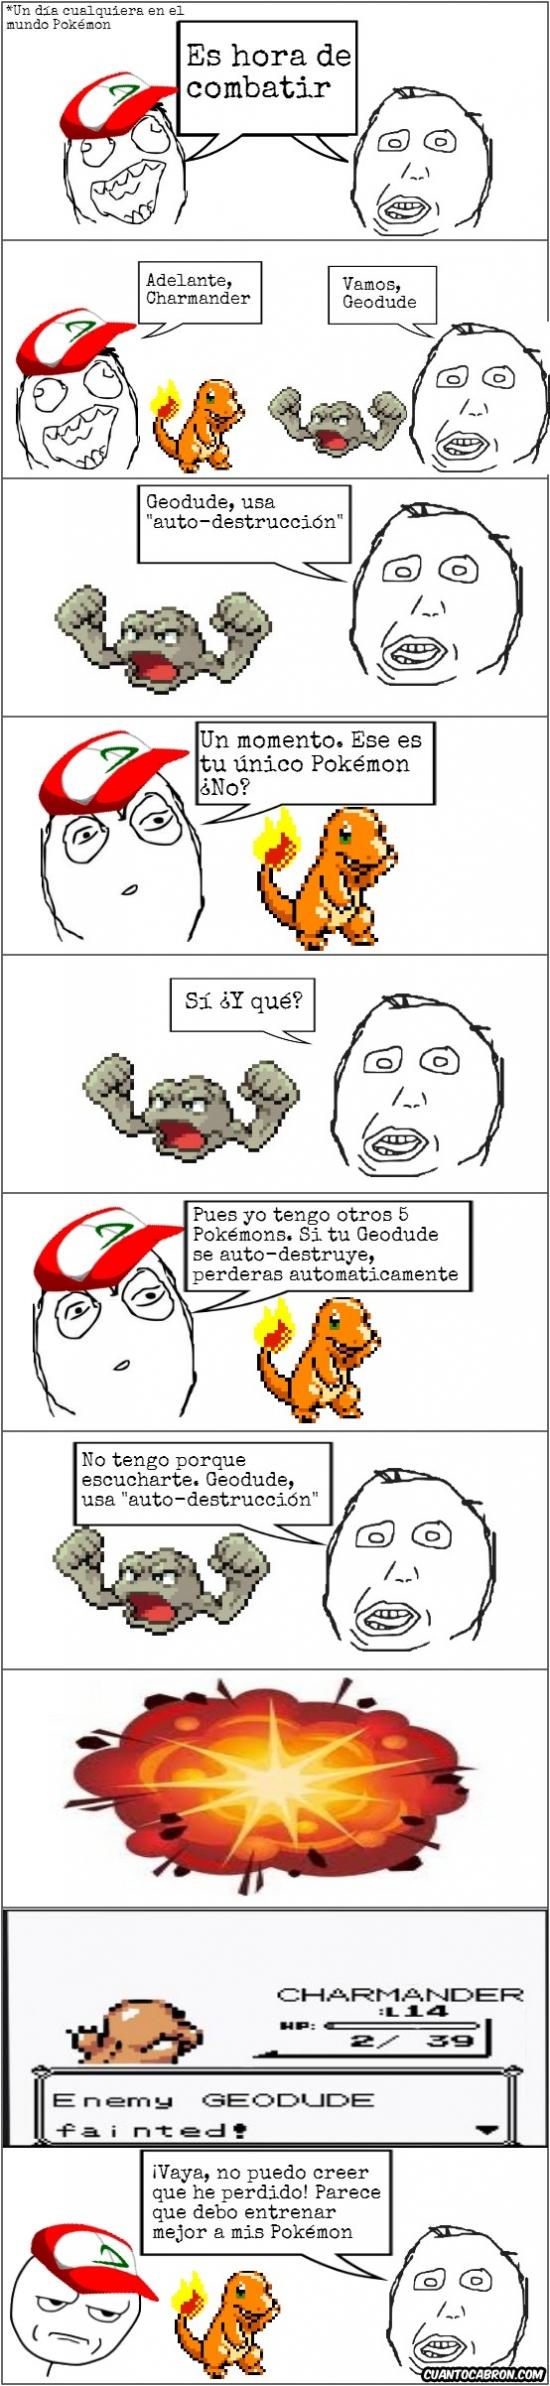 Kidding_me - Los entrenadores Pokémon son así de listos